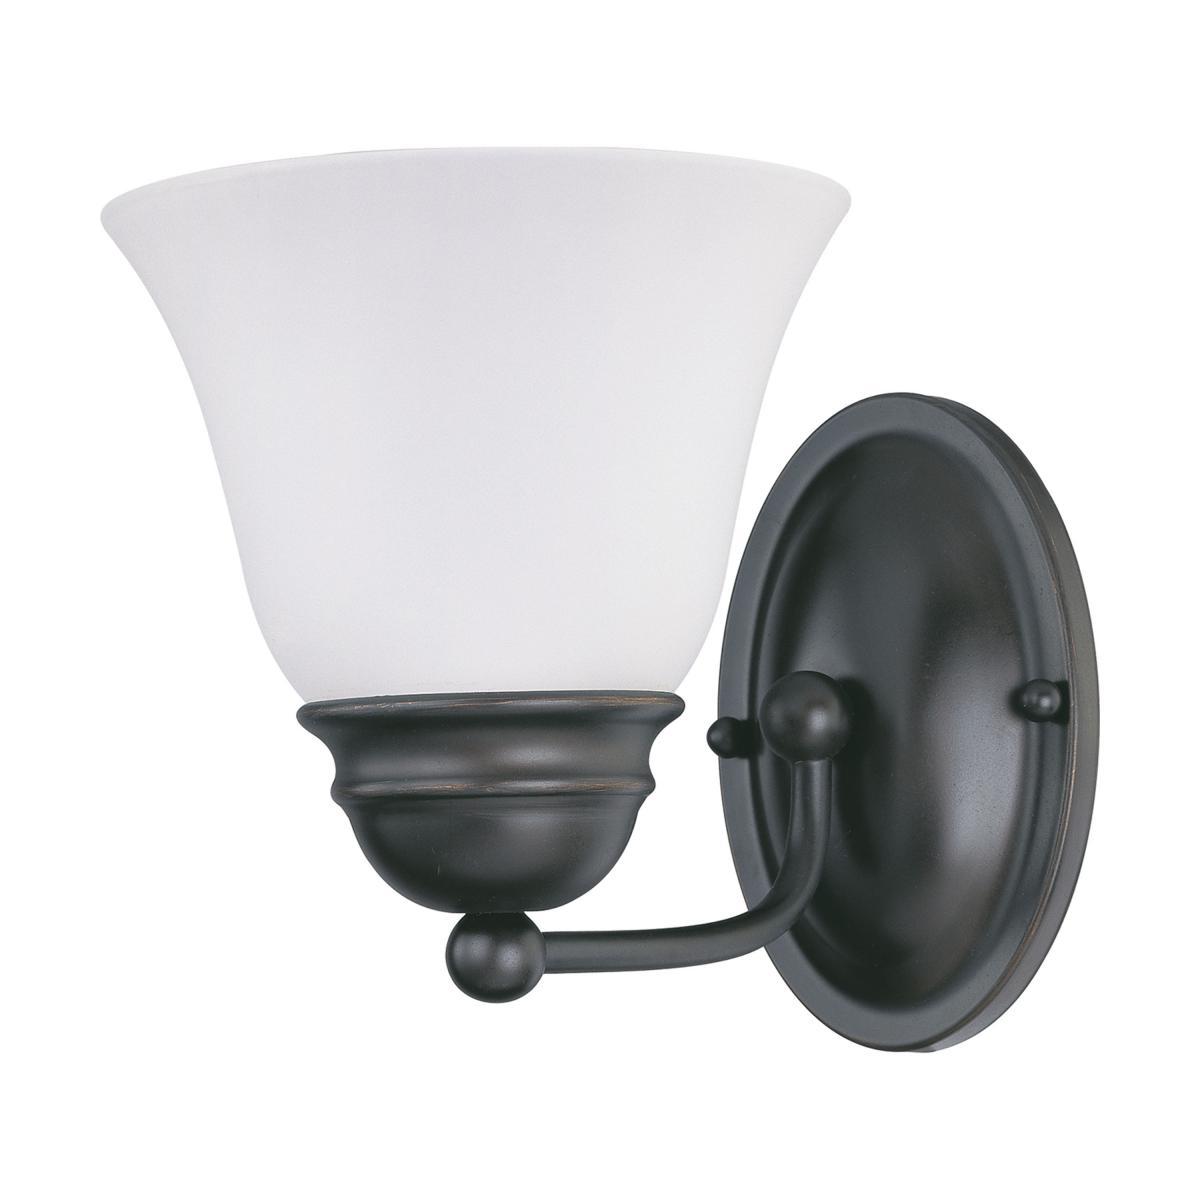 60-3165 EMPIRE 1 LIGHT 7